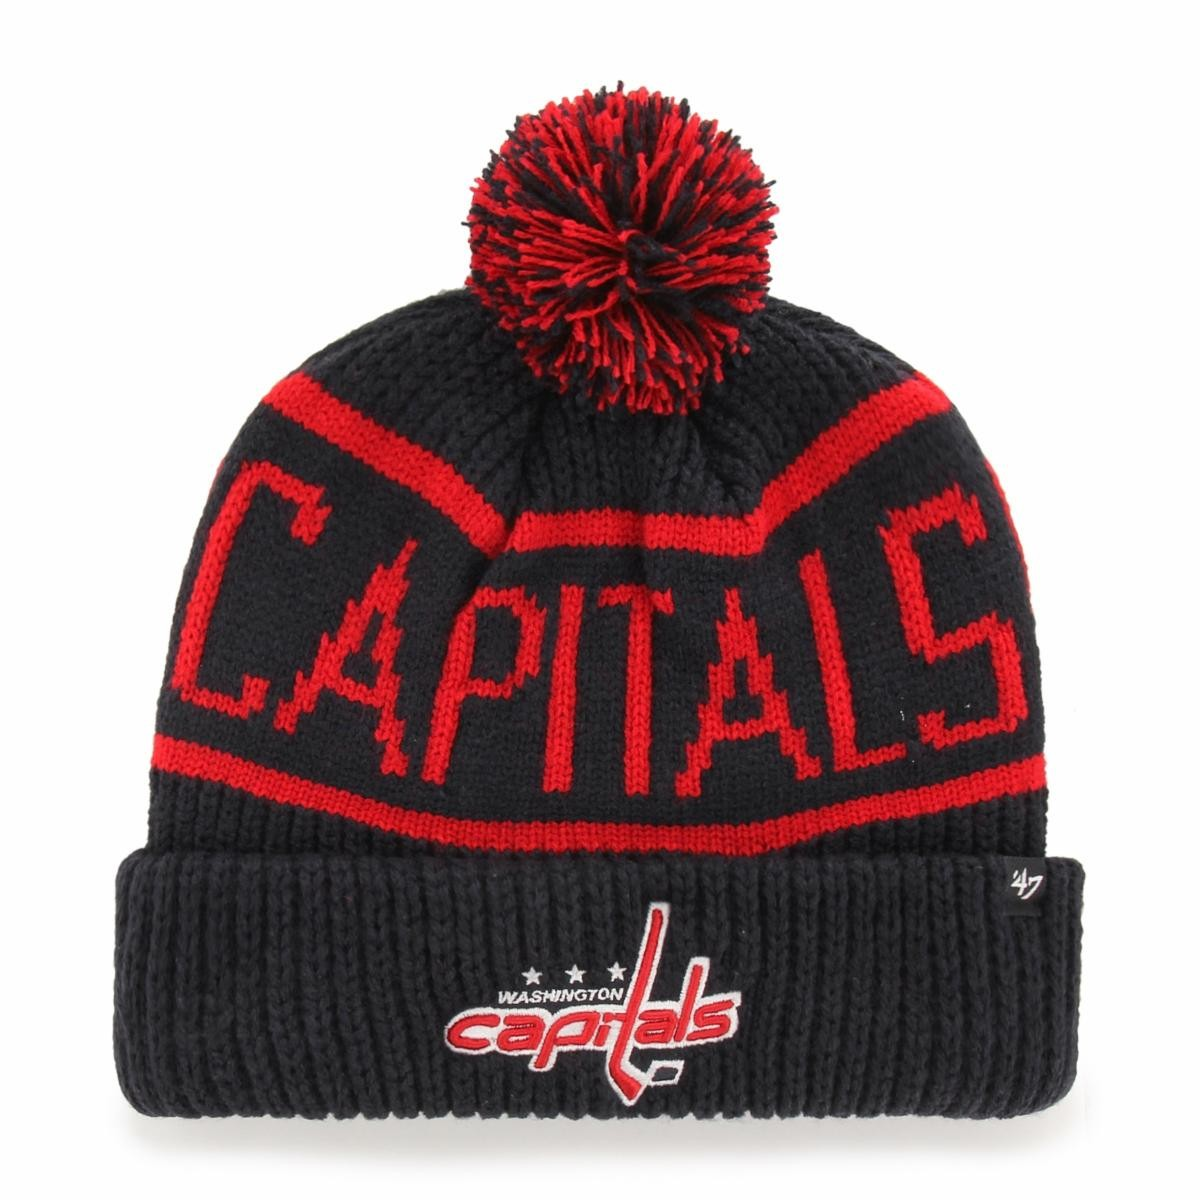 BRAND 47 Washington Capitals Calgary Cuff Knit Winter Hat